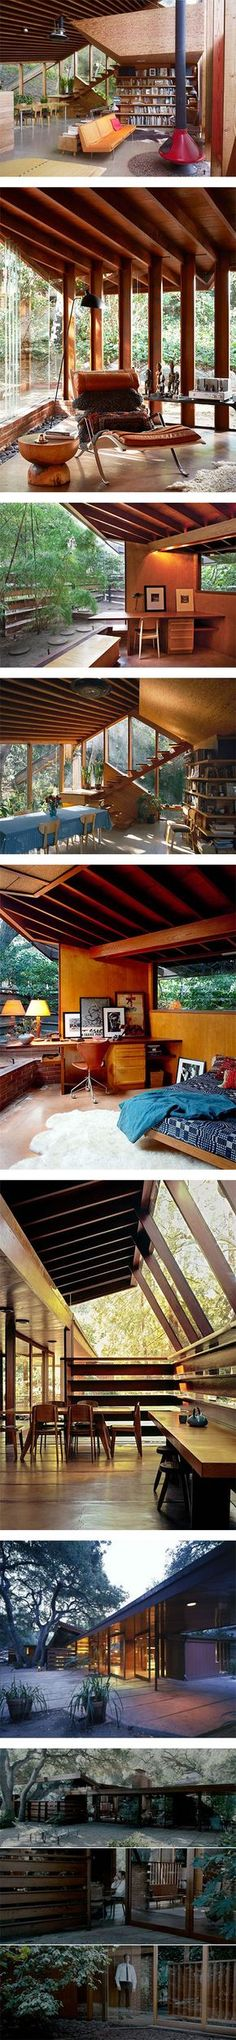 The Lautner House from 'A Single Man' via Nuji.com